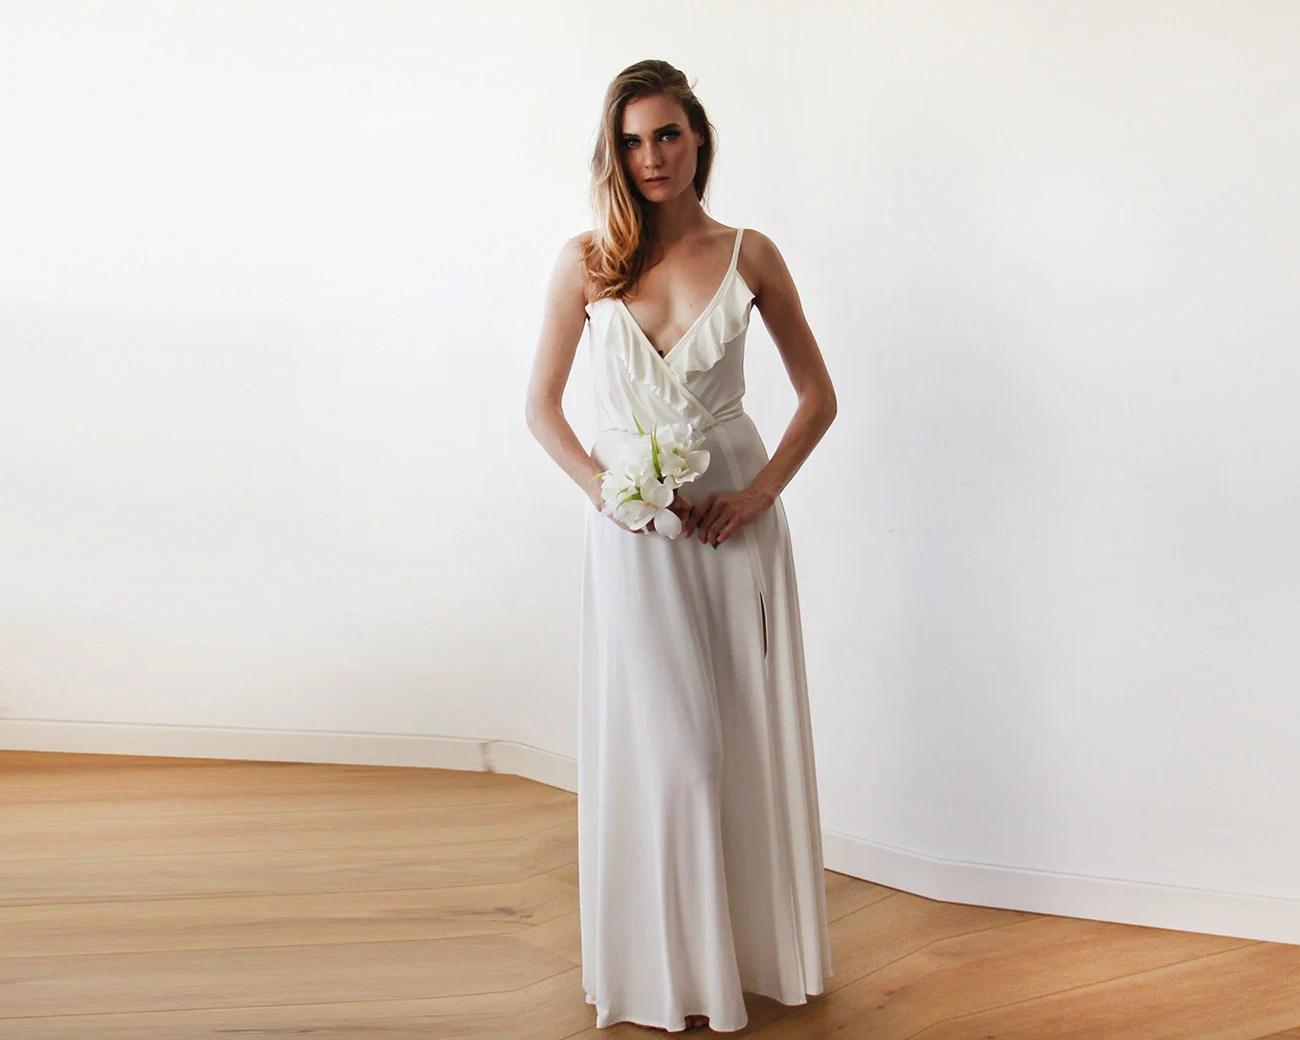 Bridal Maxi Wrap Straps Dress Ivory Straps Wrap Gown With